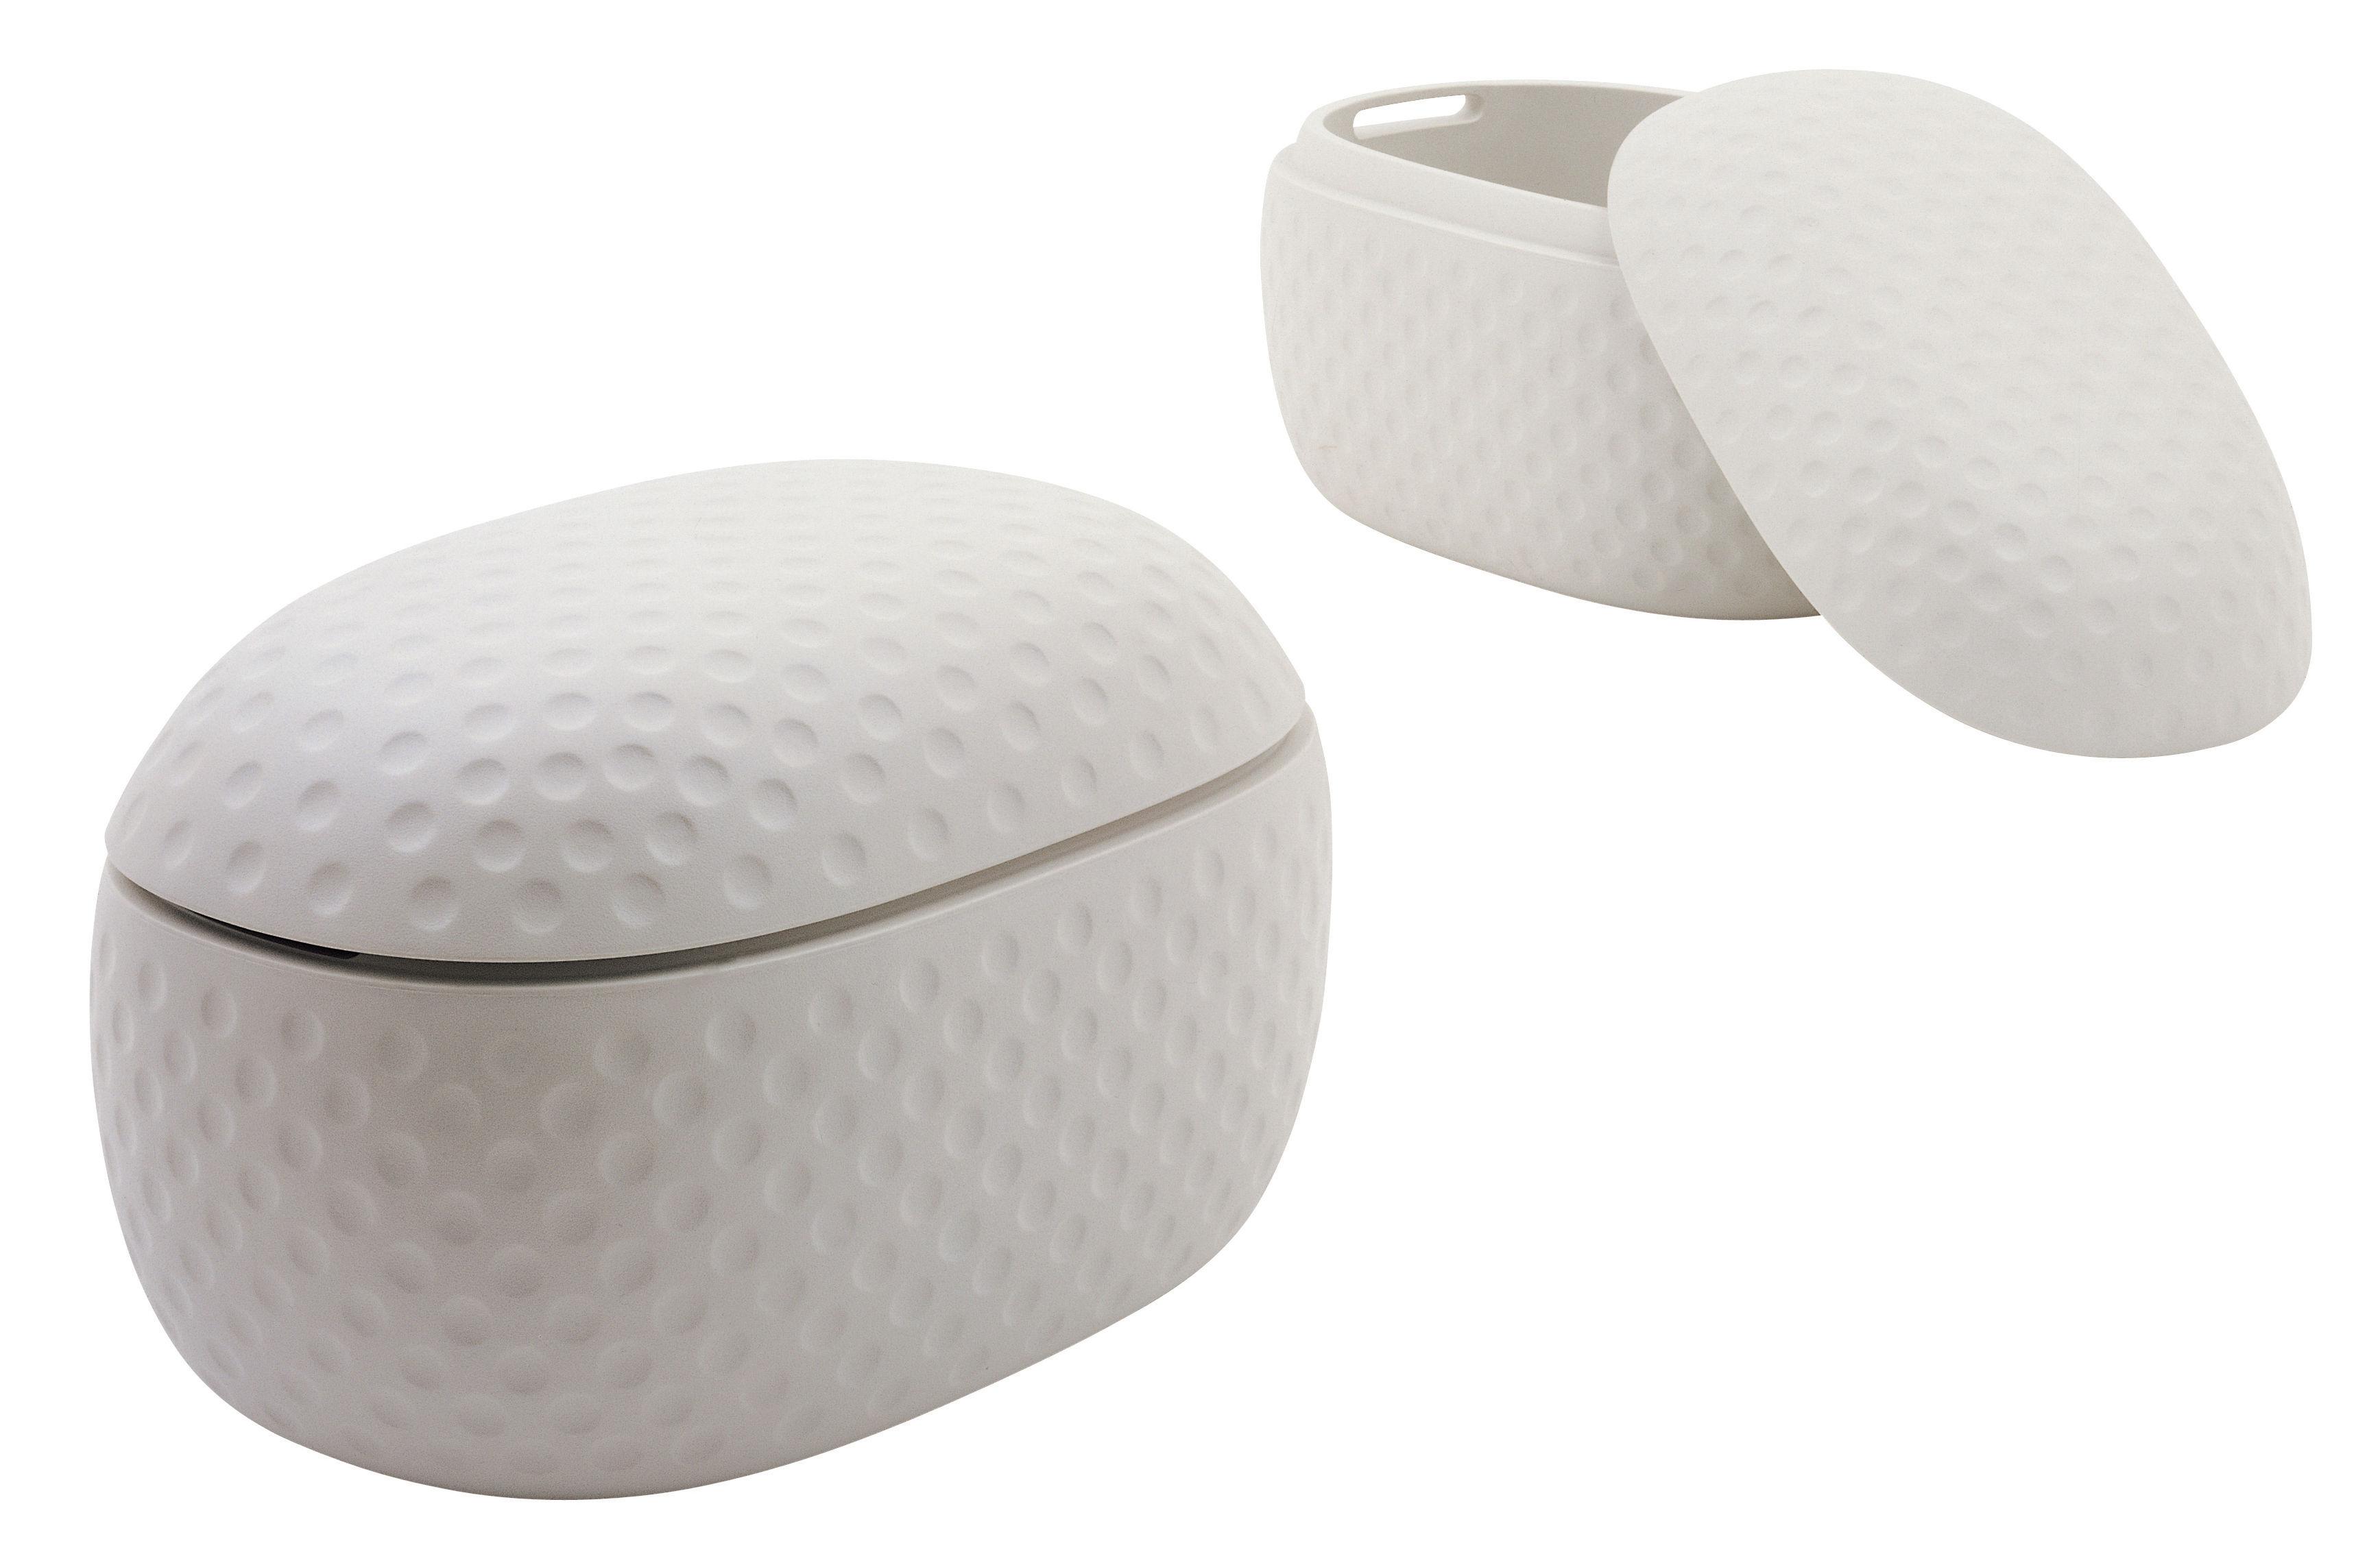 coffre el baul blanc magis collection me too. Black Bedroom Furniture Sets. Home Design Ideas